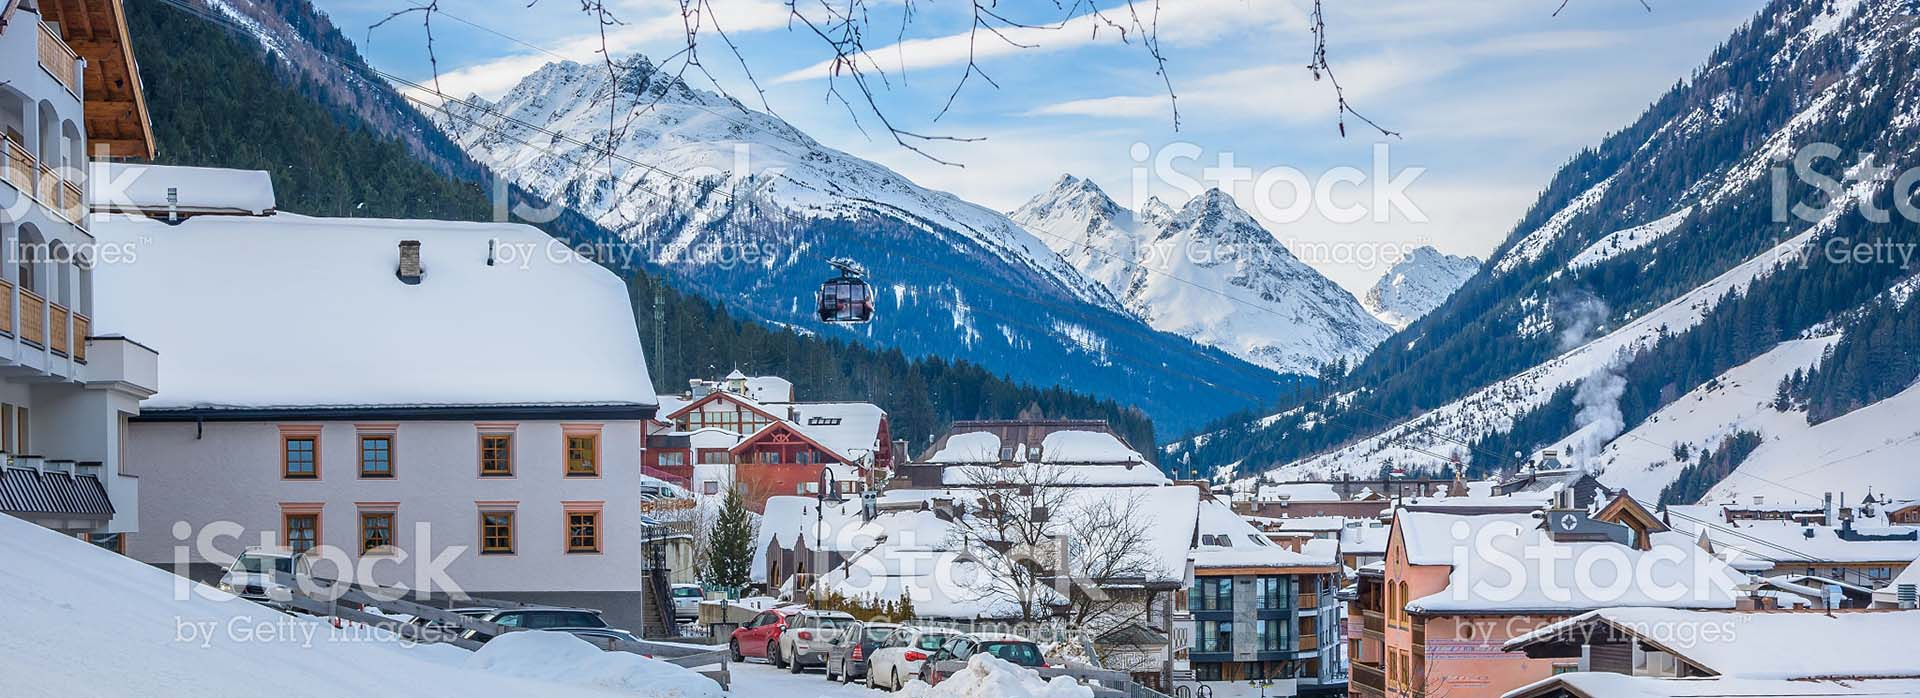 23rd Annual Luxury Real Estate European Ski Trip